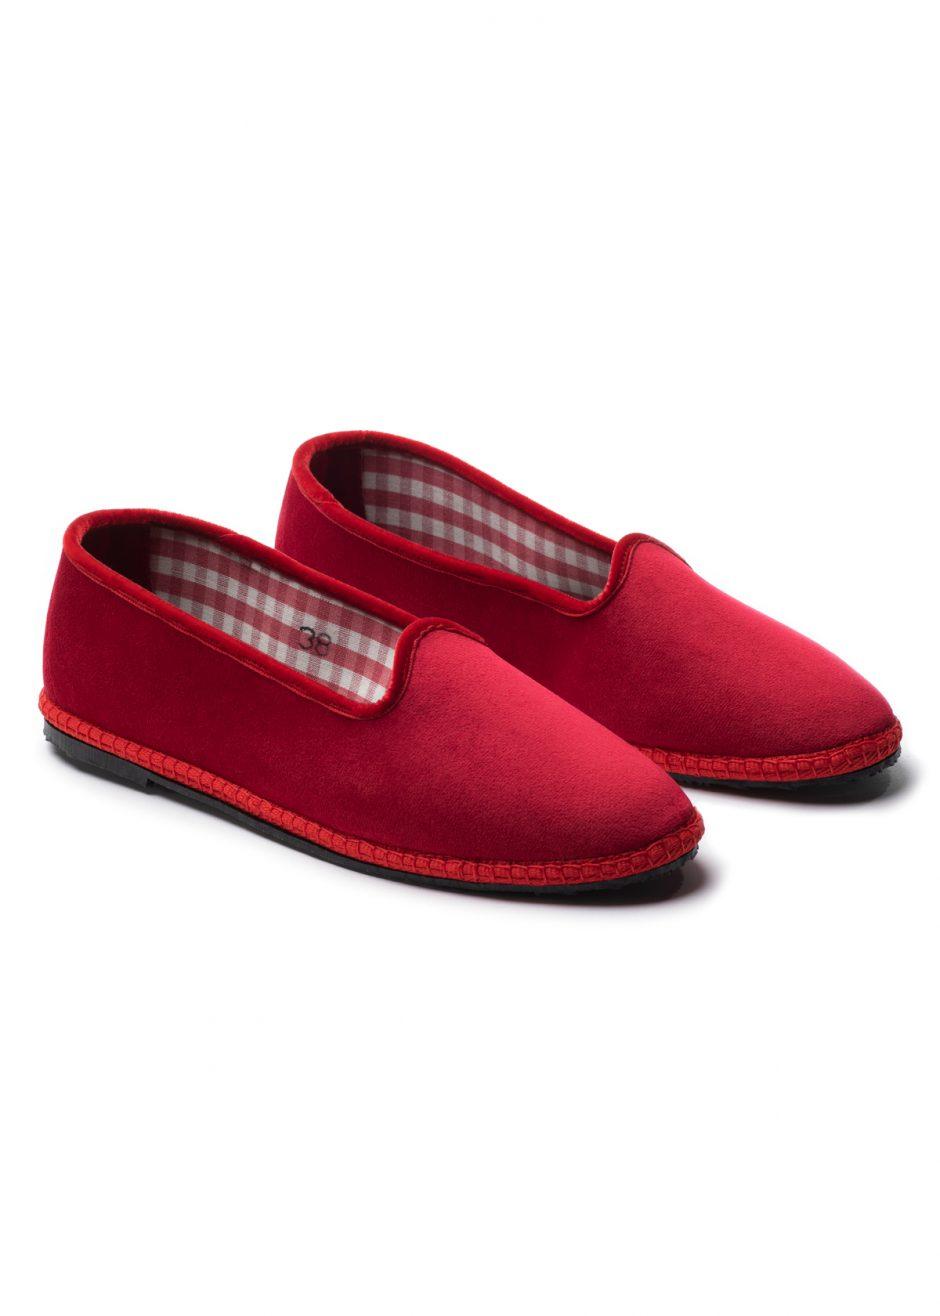 Rialto – Furlana red velvet